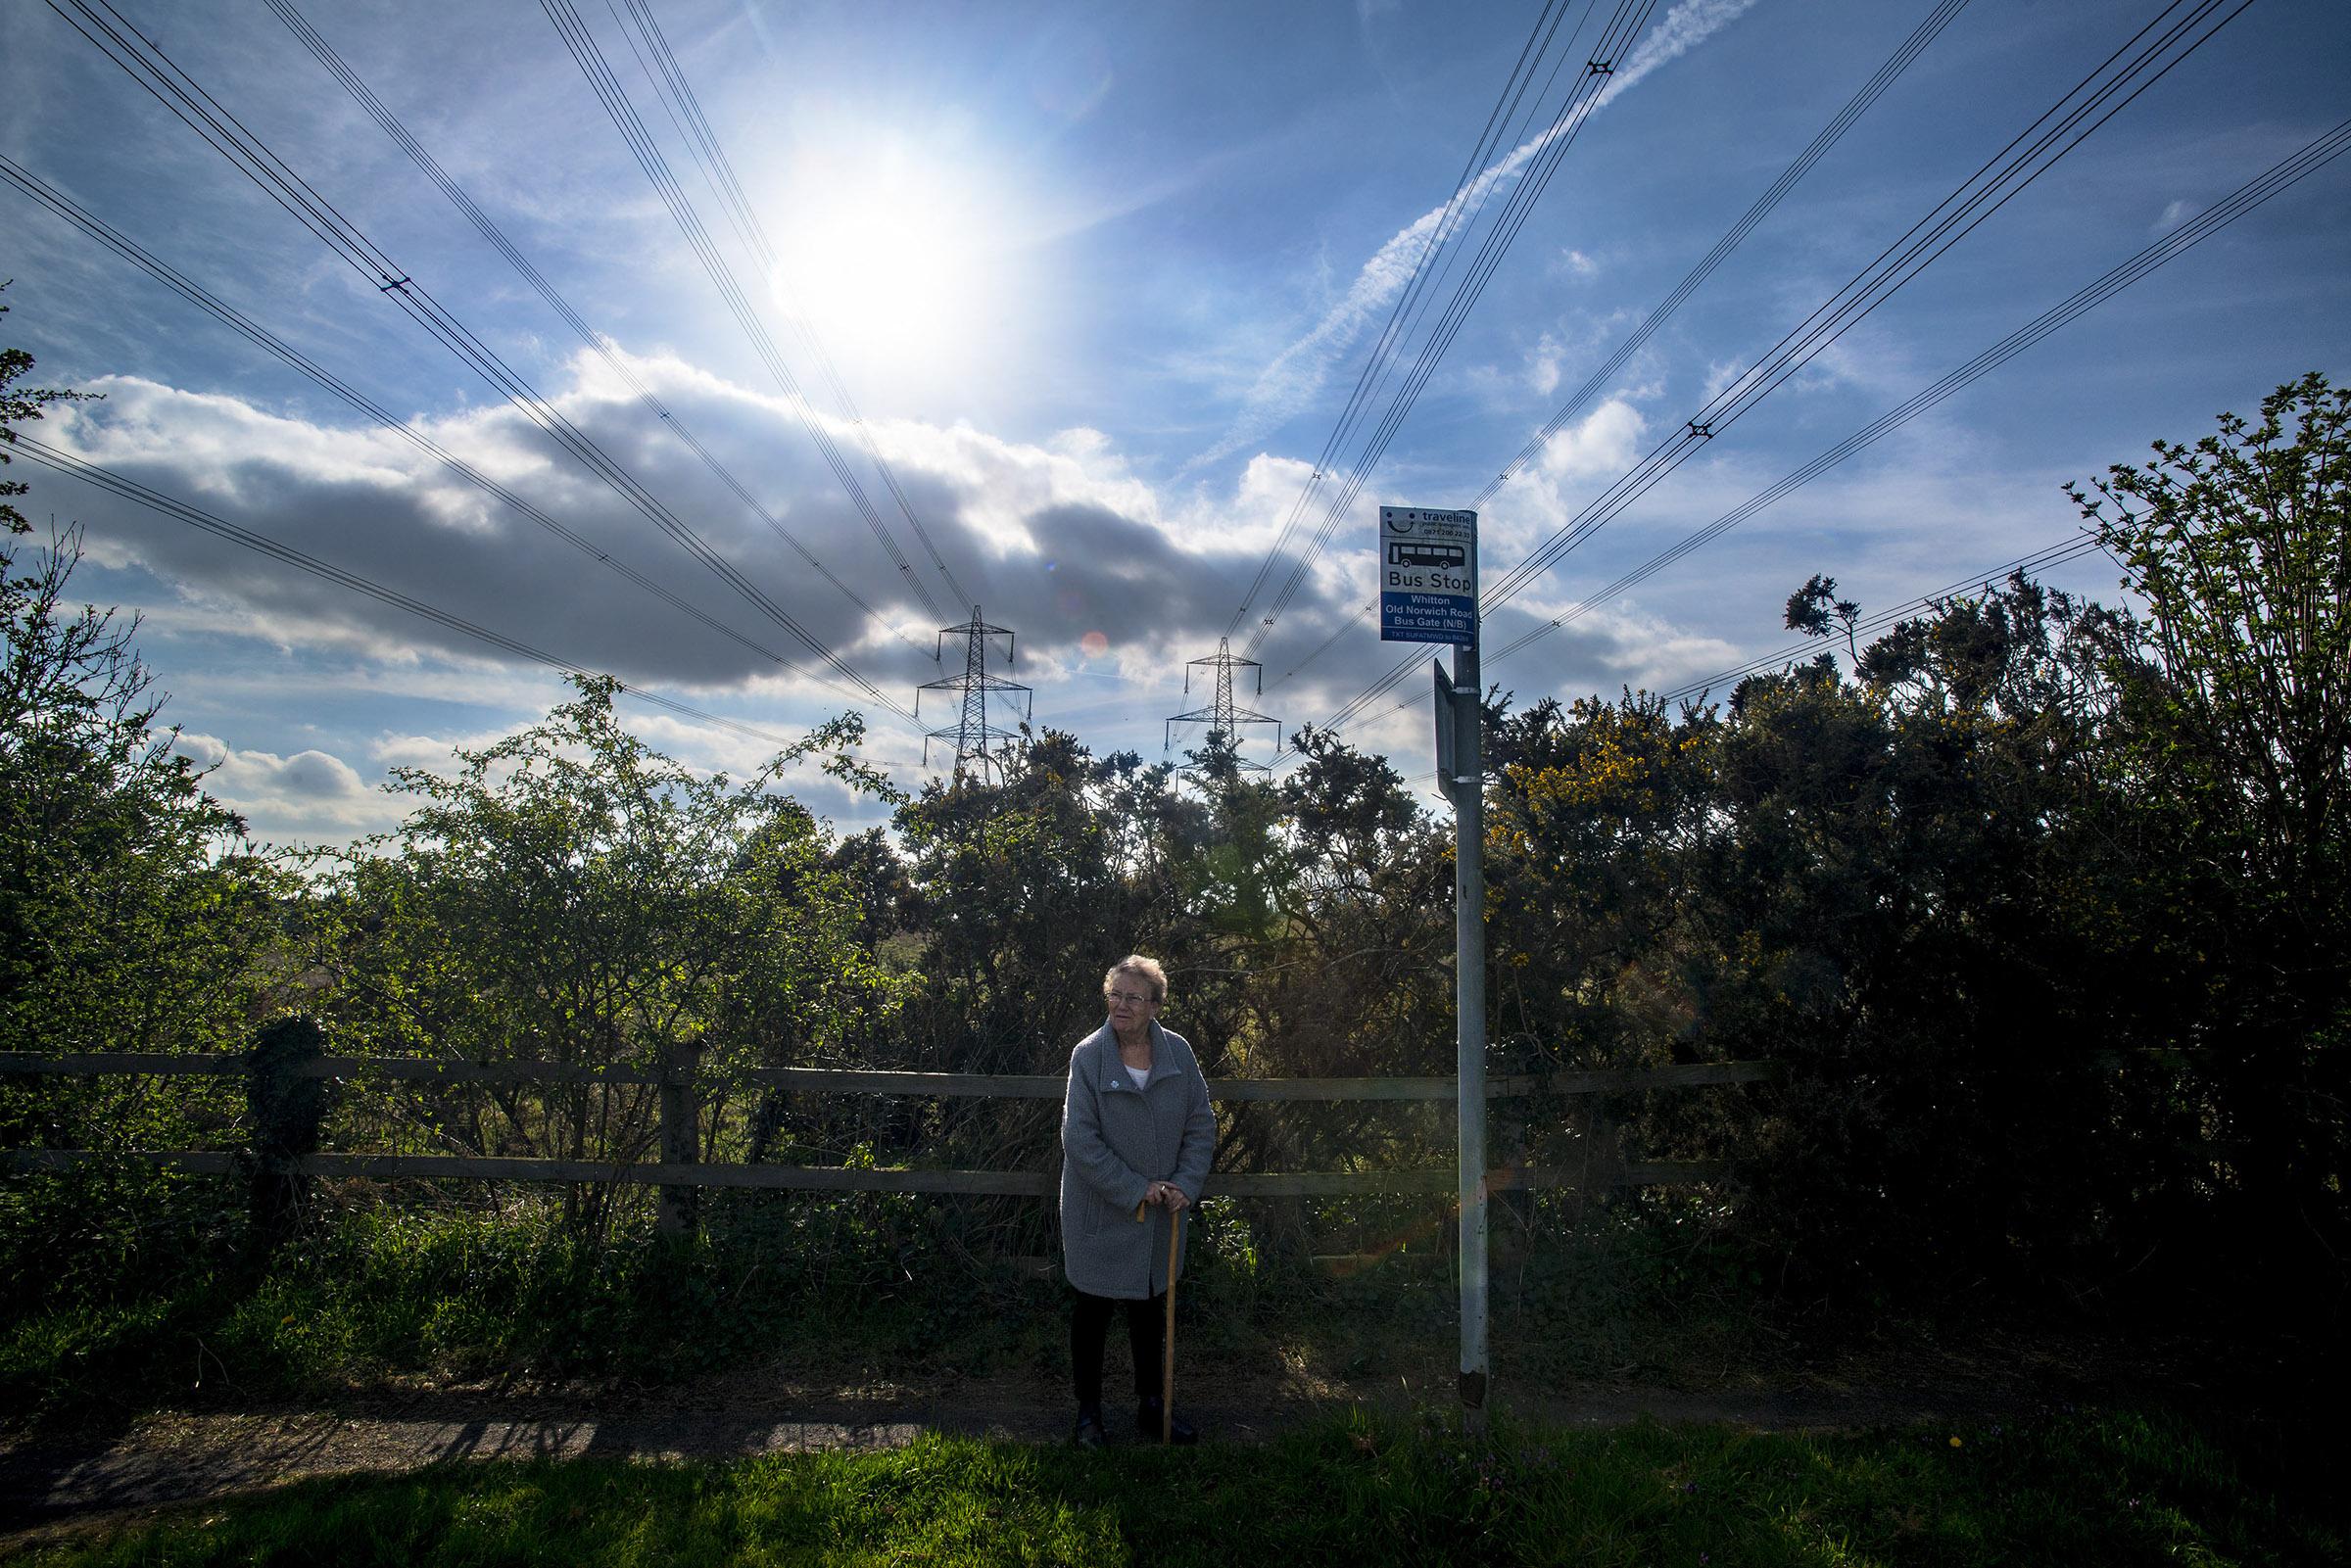 Rural Loneliness - Picture by John Ferguson